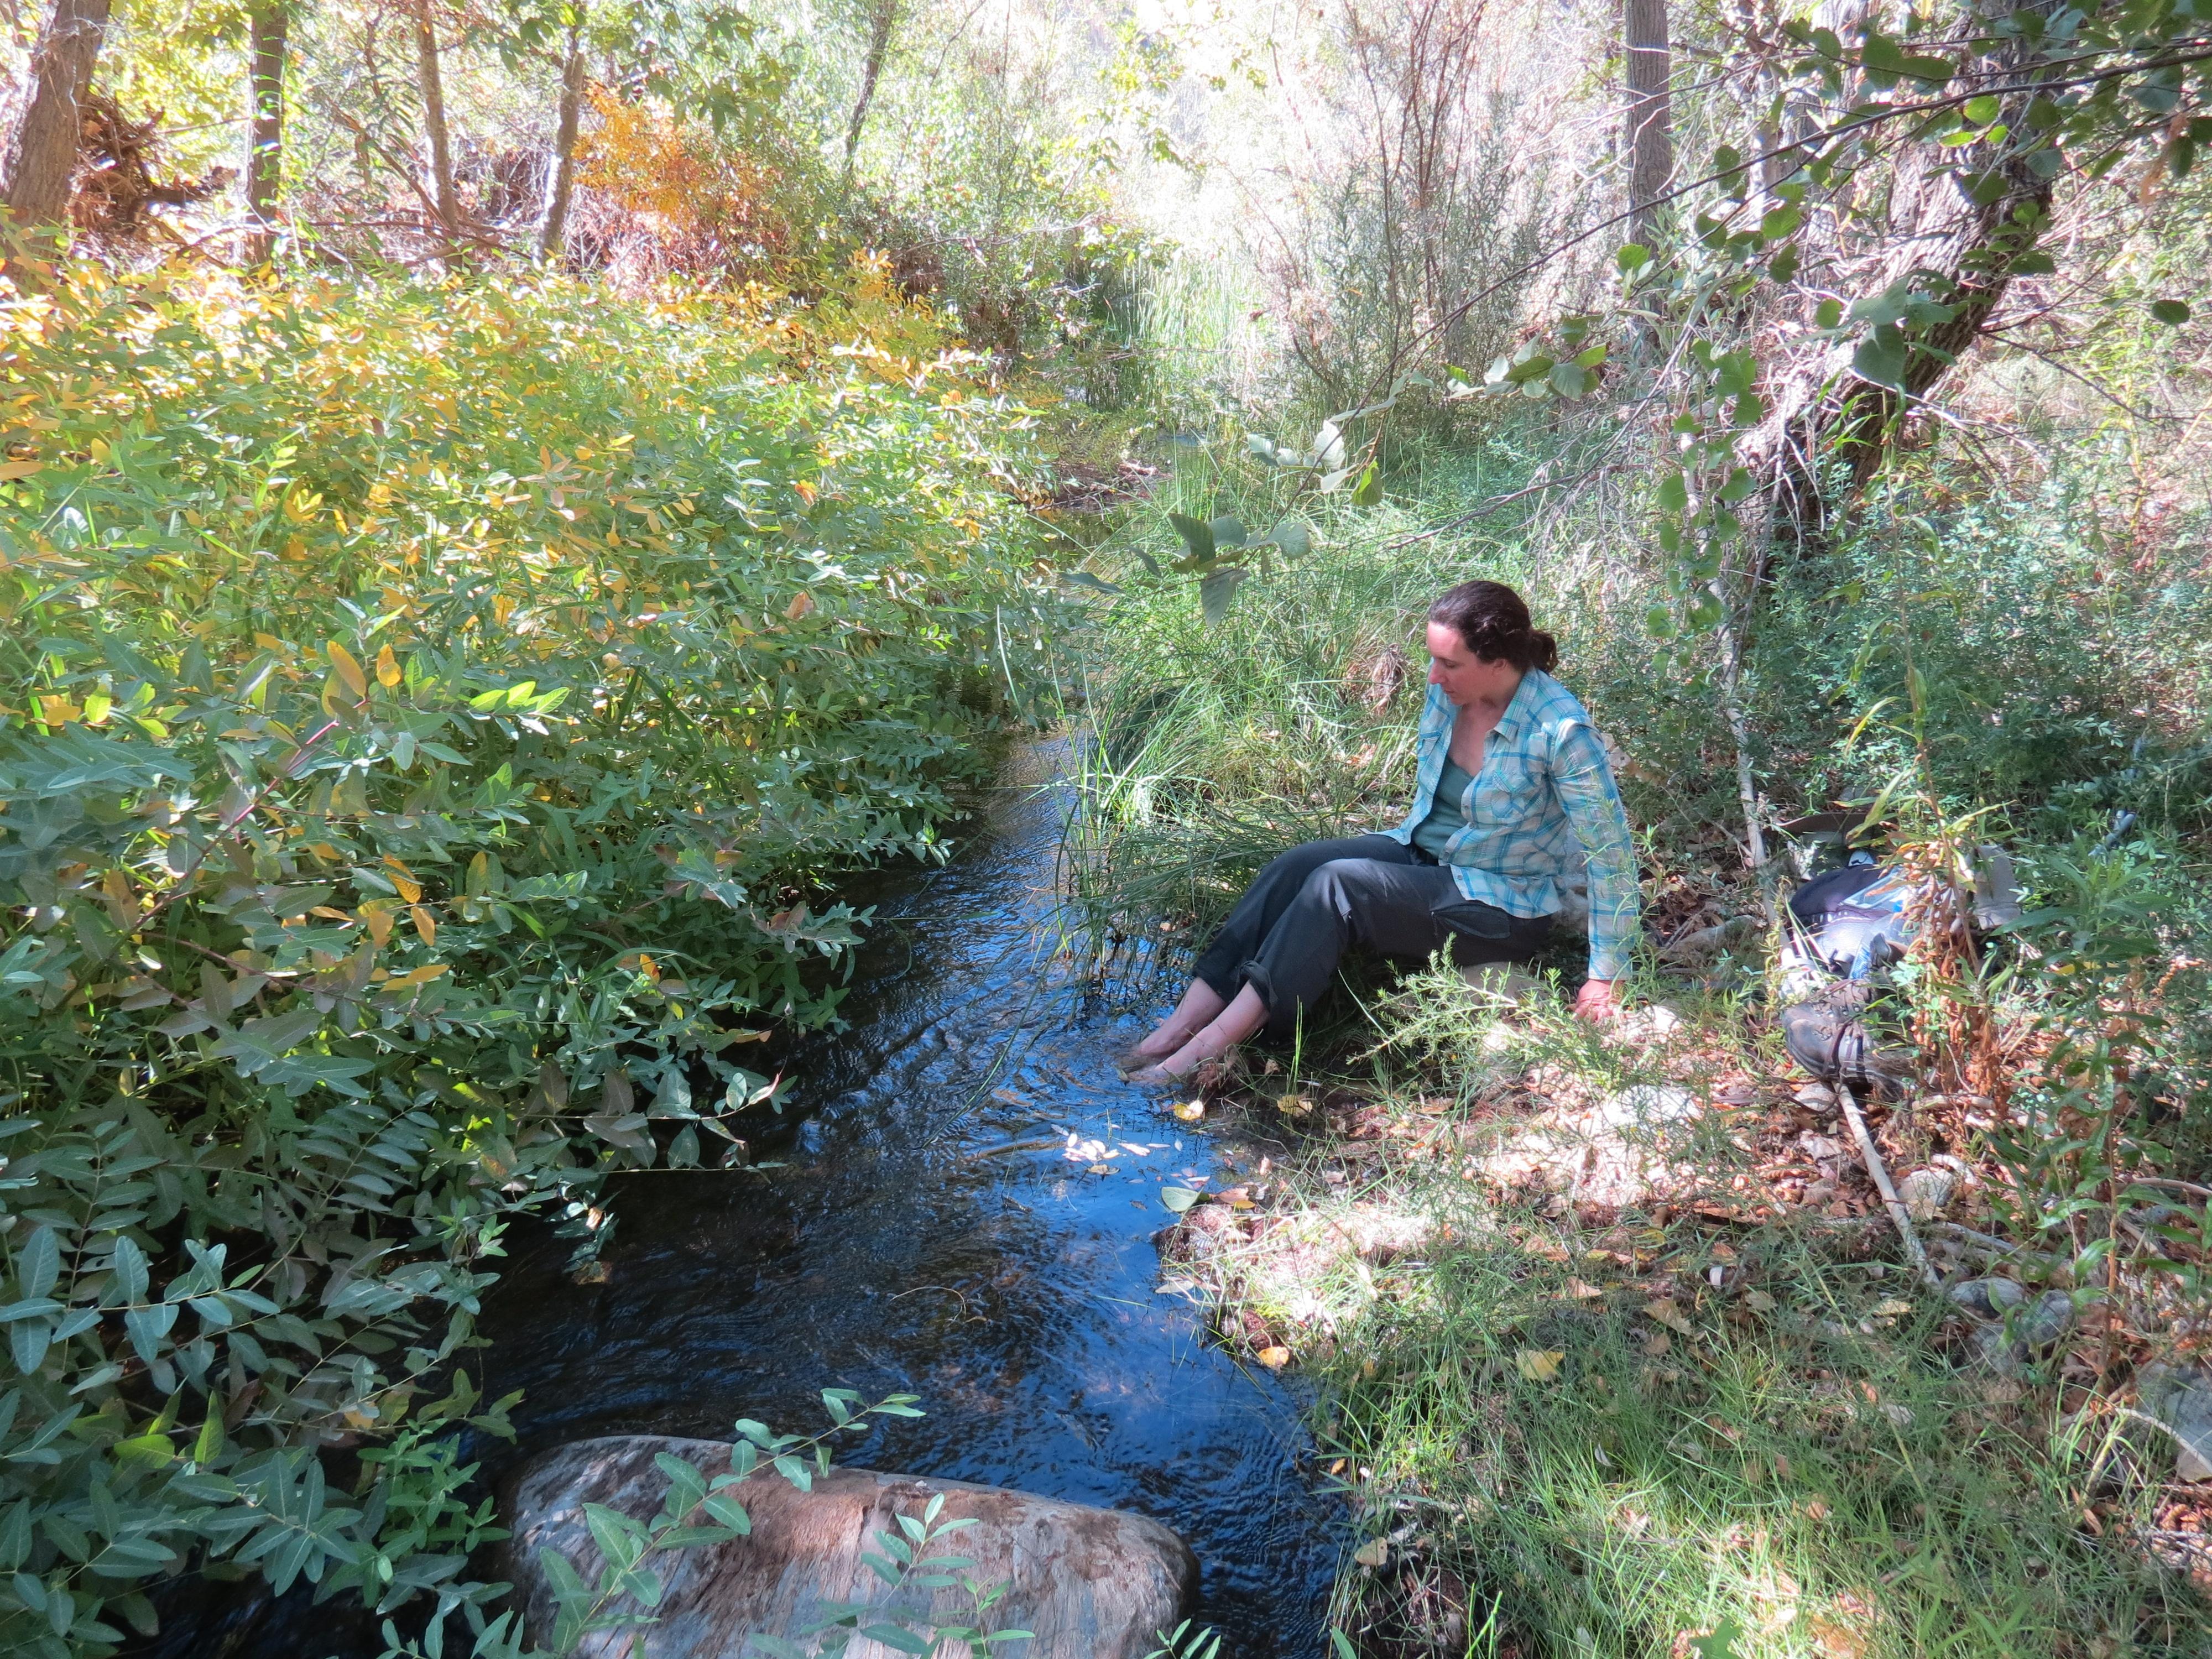 Dogbane Piru Creek hike Sespe Wilderness Los Padres National Forest